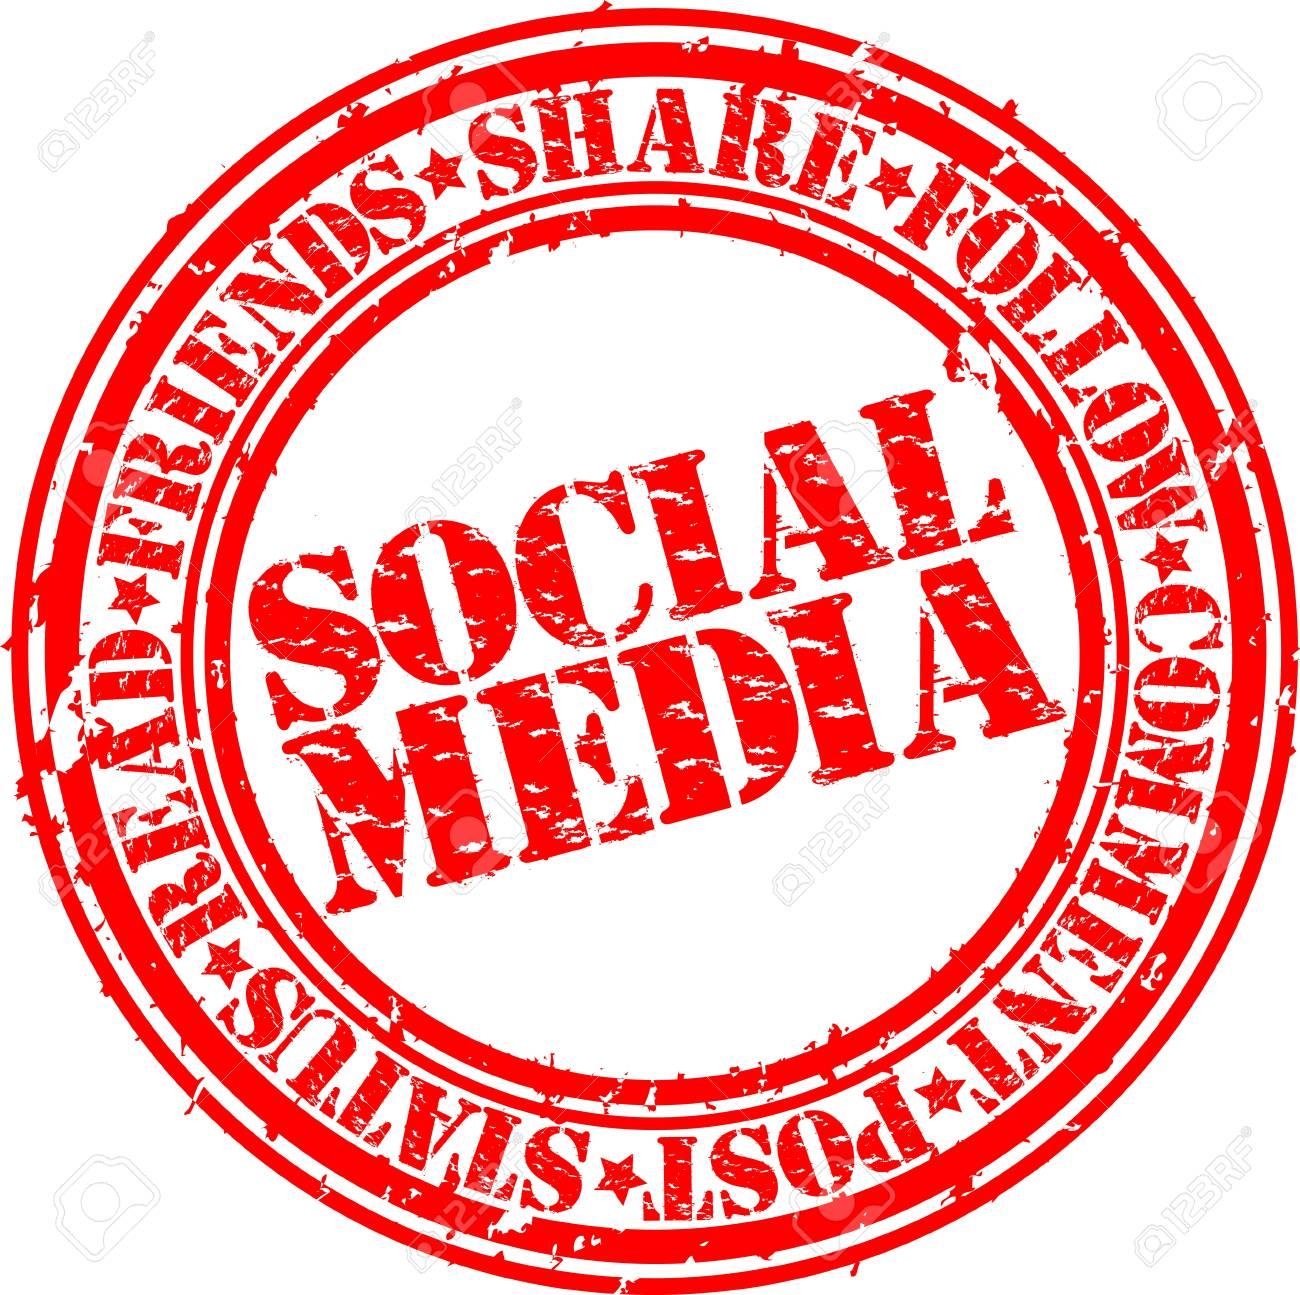 Grunge social media rubber stamp,vector illustration Stock Vector - 14634693